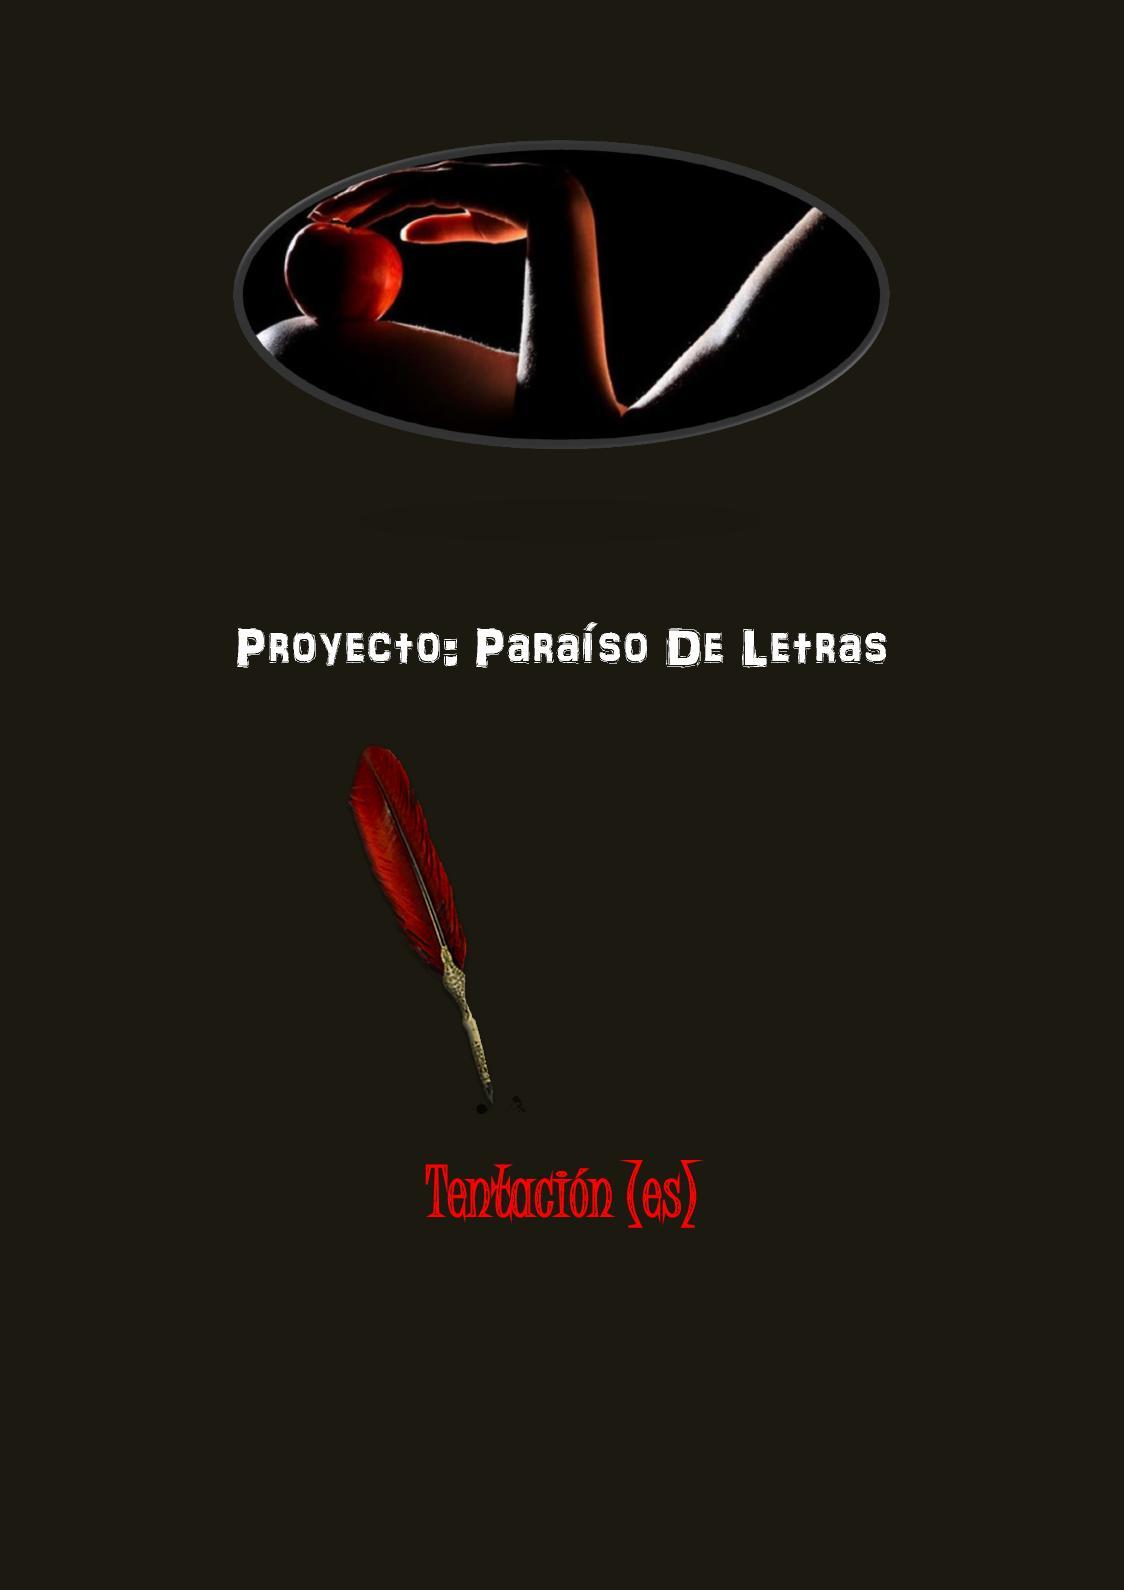 0ce8d8c12 Calaméo - Proyecto Paraíso  Tentación (es)